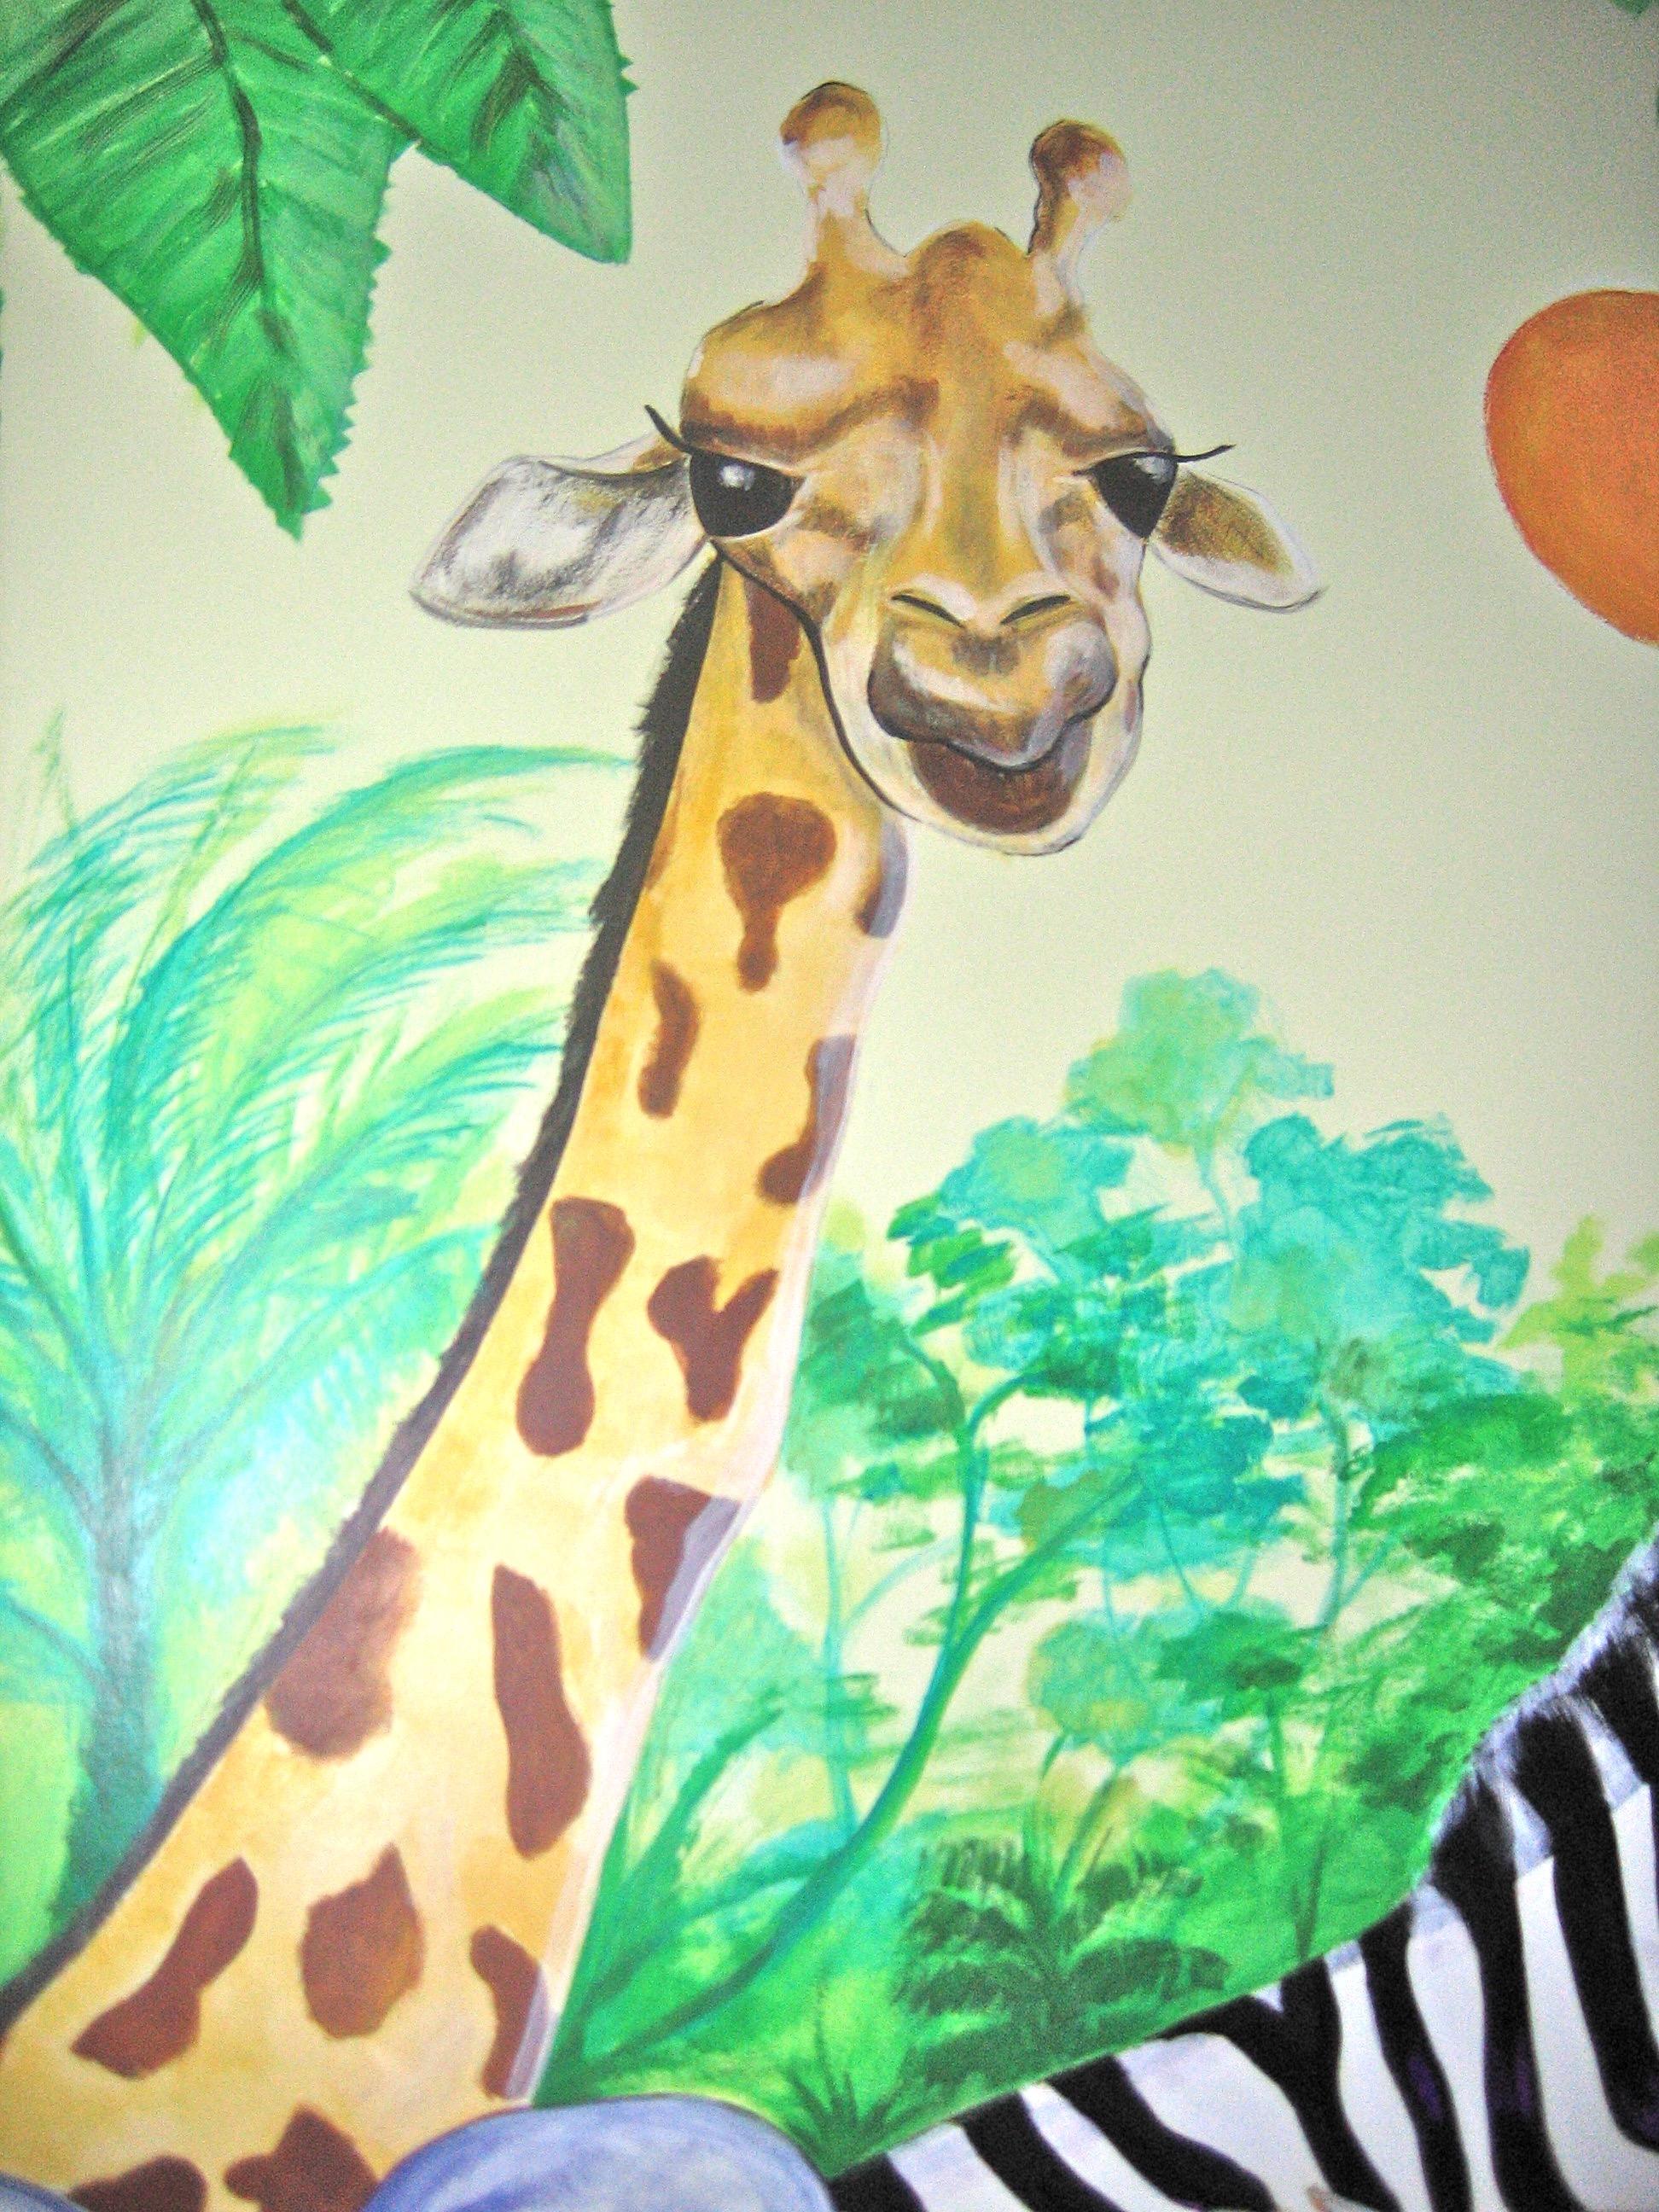 jungleroom - 4